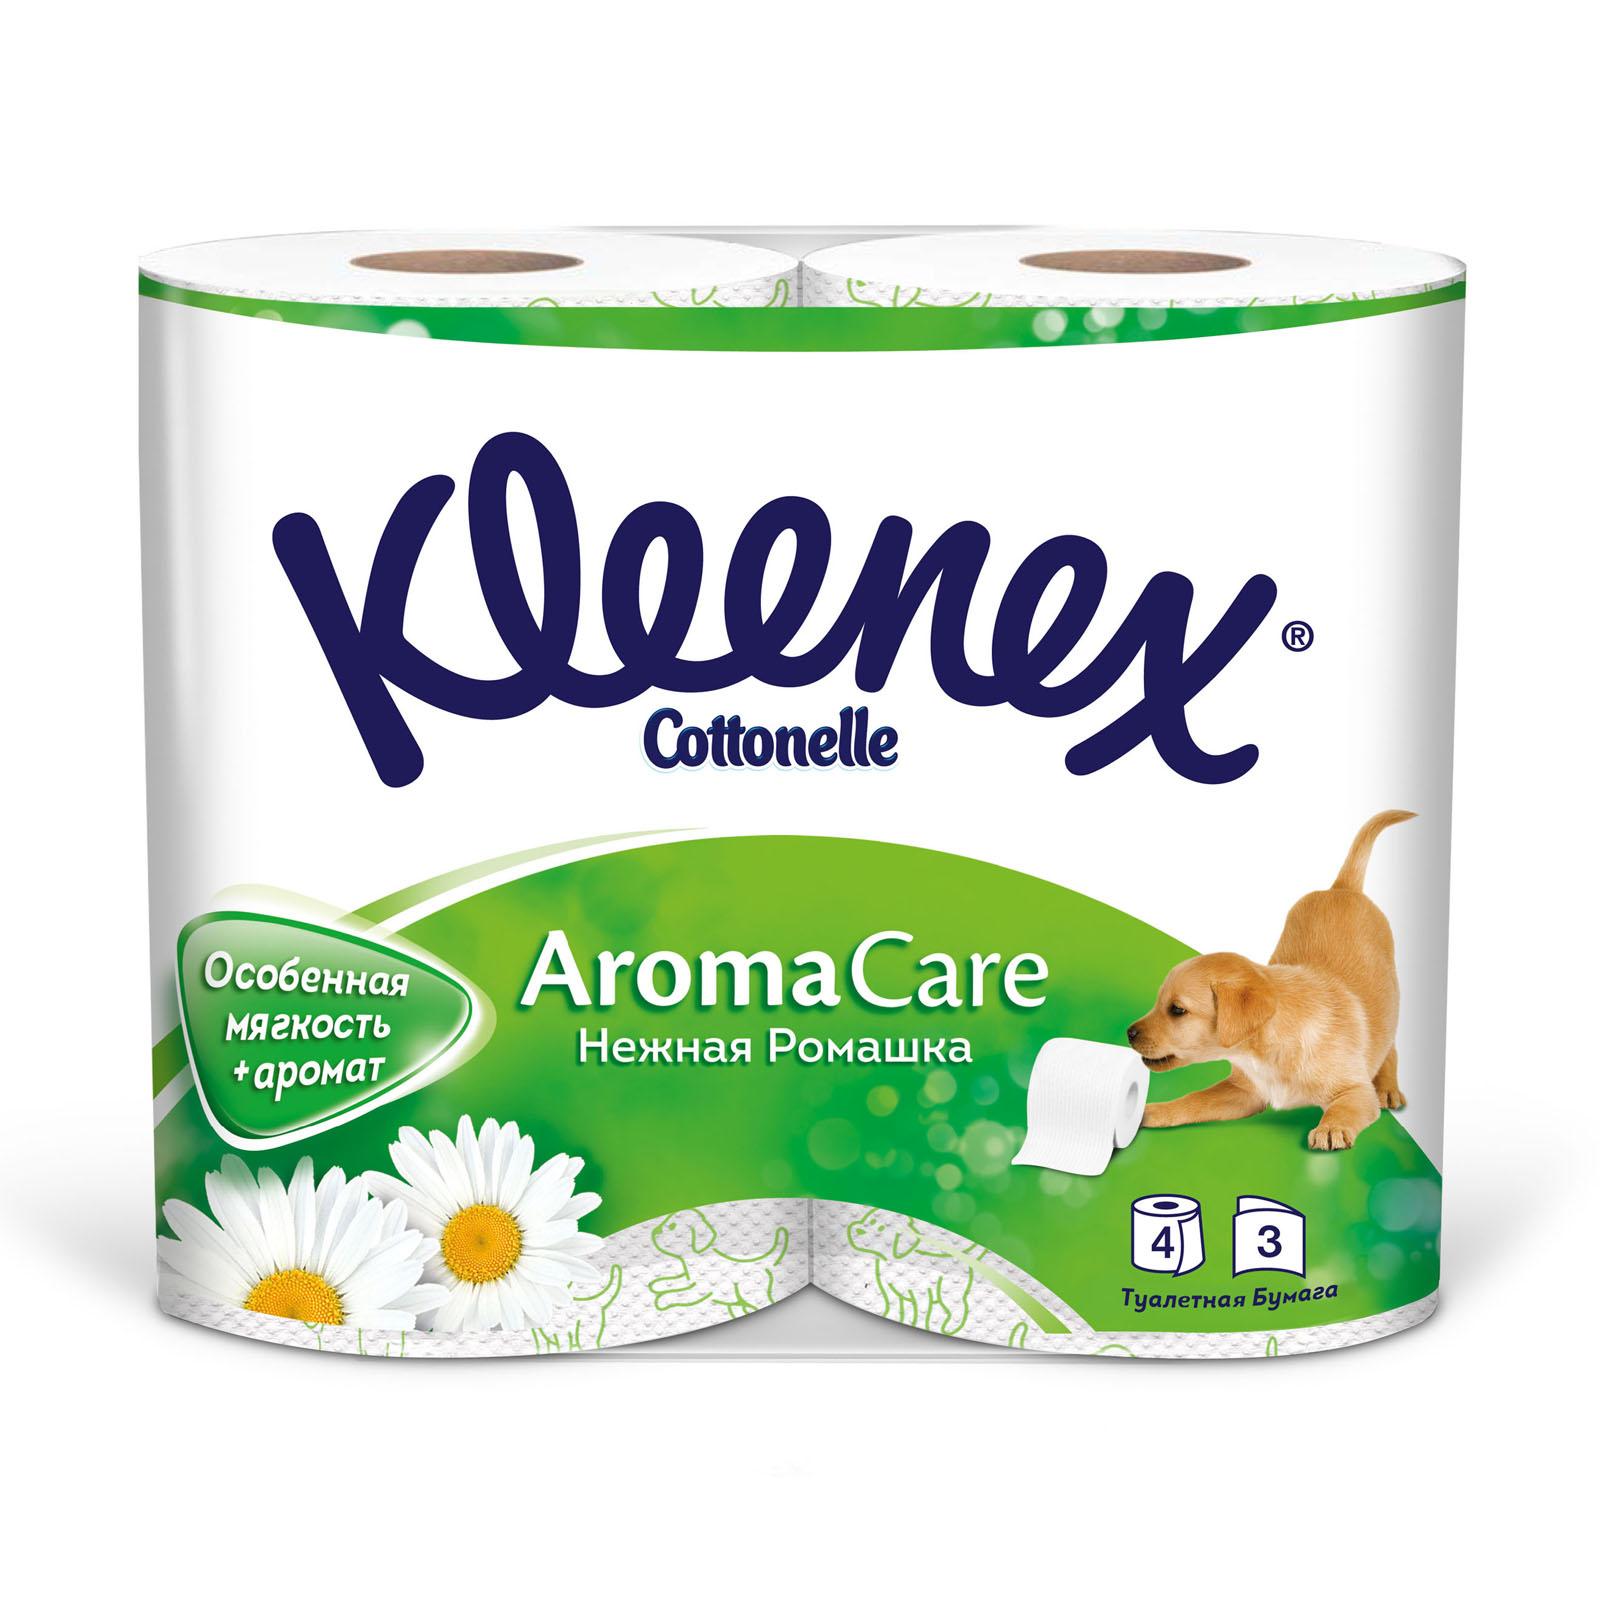 ��������� ������ Kleenex ������� (3 ����) 4 ��